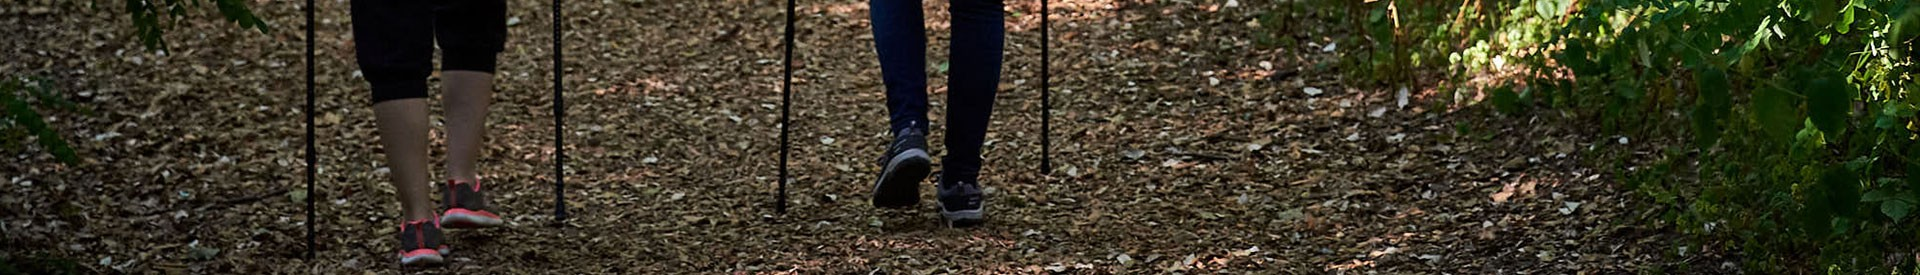 rando-pedestre-1653